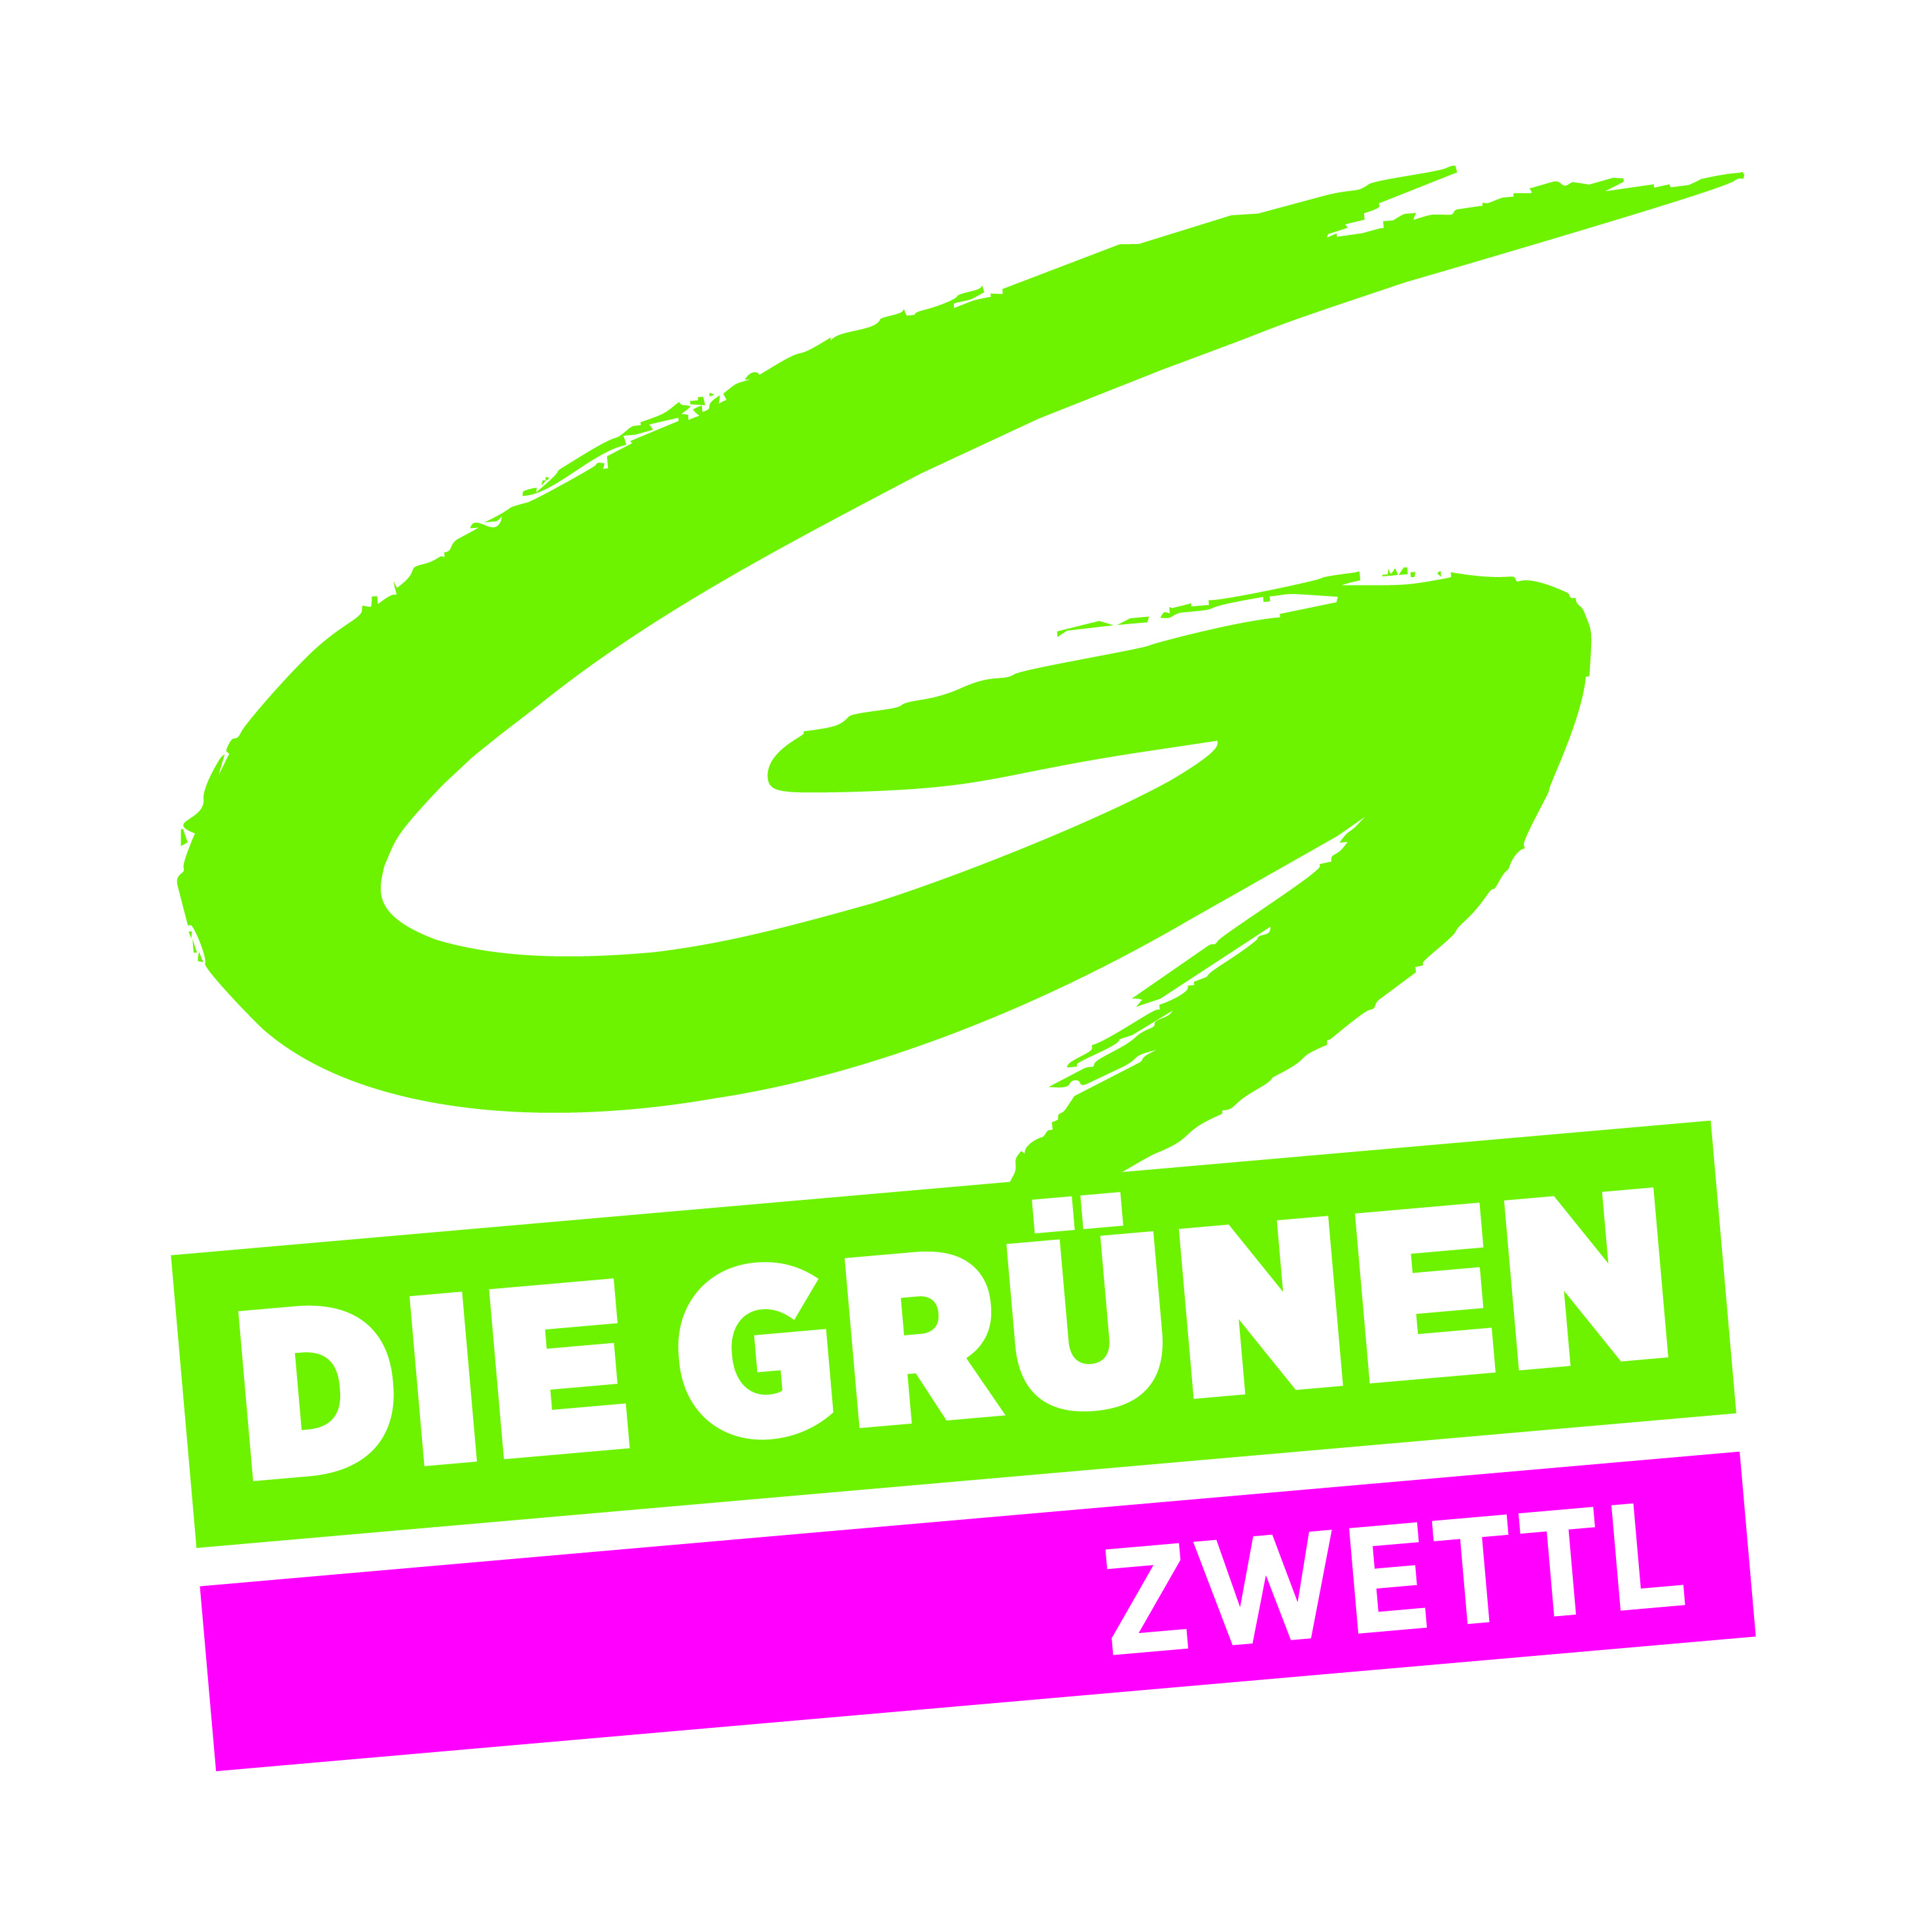 Online Chat & Dating Zwettl   Lerne Mnner & Frauen in Zwettl